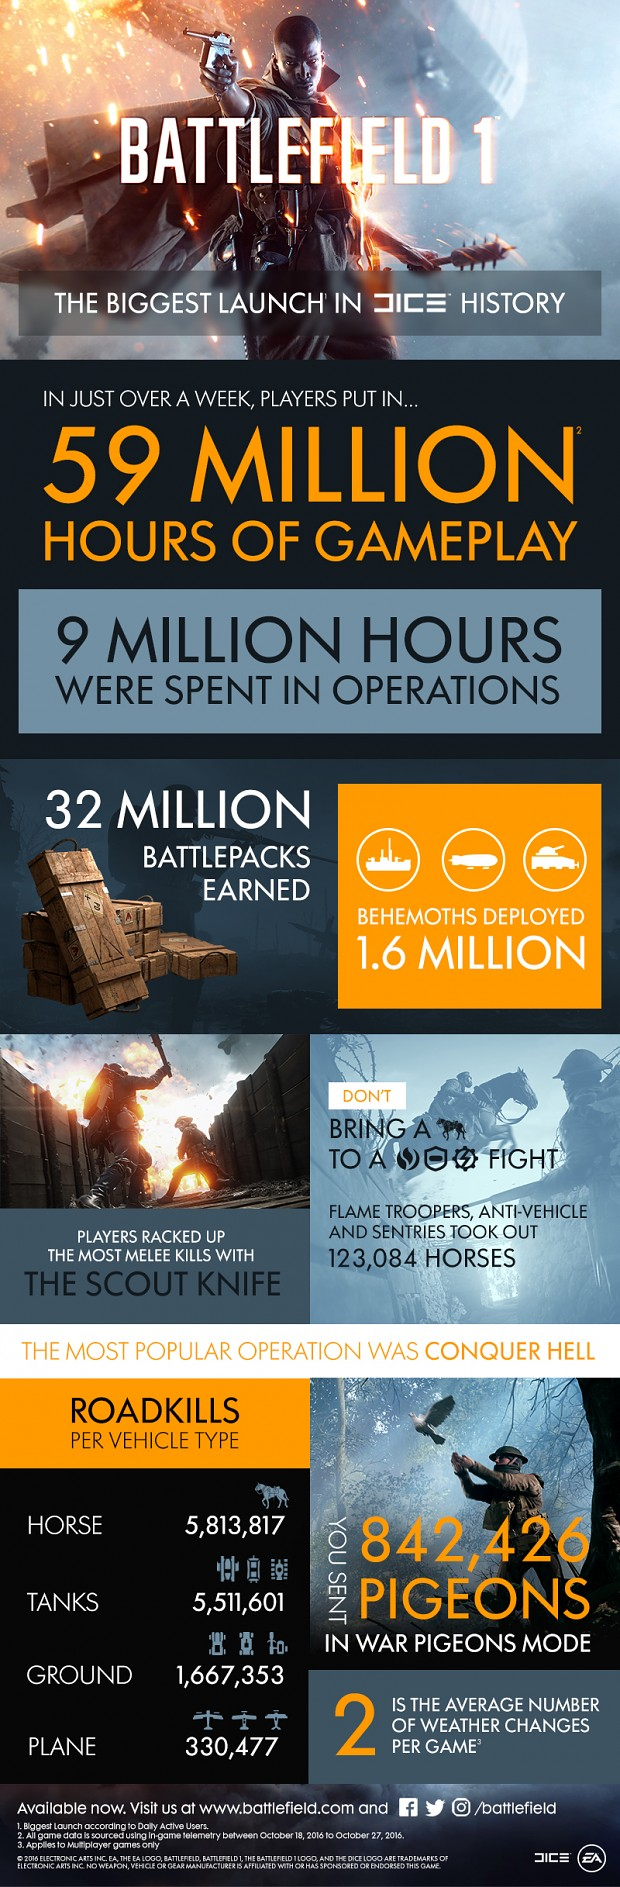 Battlefield 1 Infographic